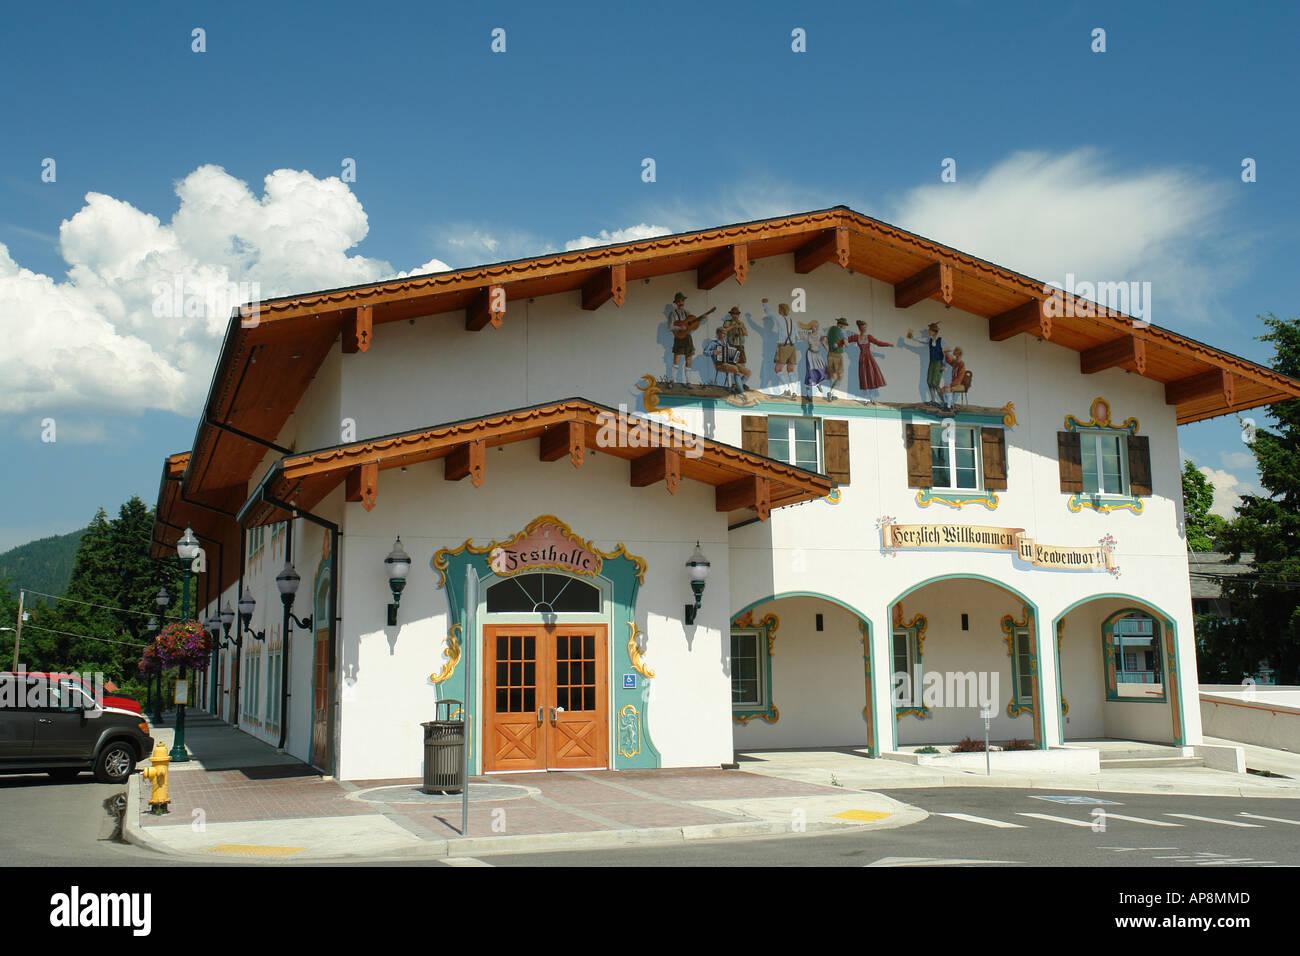 AJD52985, Leavenworth, WA, Washington, Bavarian Alpine Village, Festhalle, fresco, wall mural Stock Photo